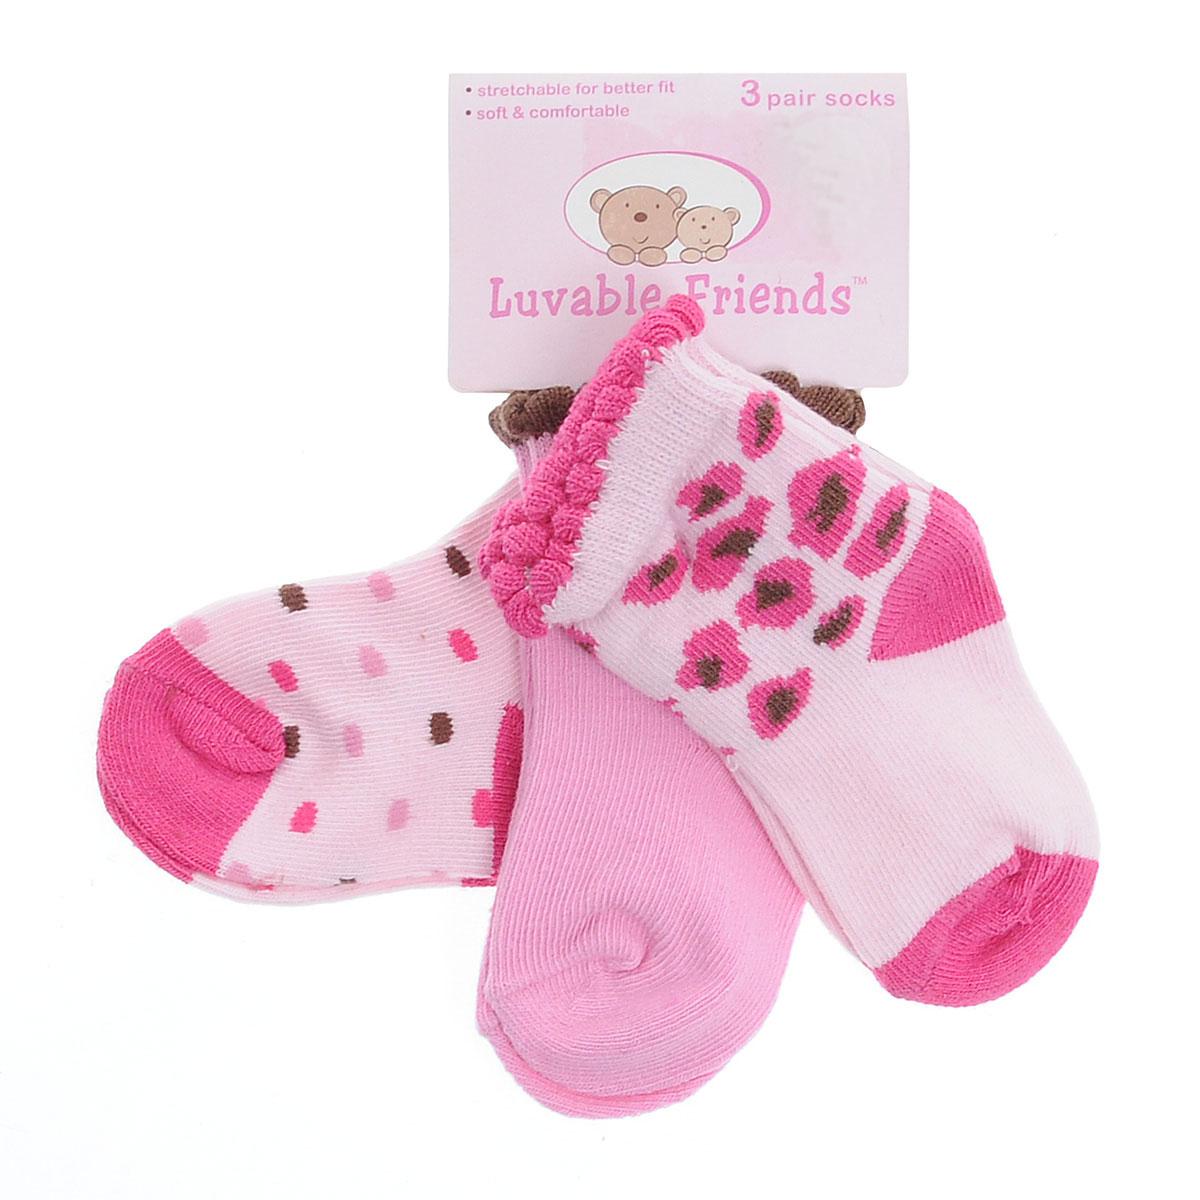 Носки для девочки Luvable Friends Fashion, цвет: розовый, коричневый, 3 пары. 23040. Размер 55/67, 0-6 месяцев